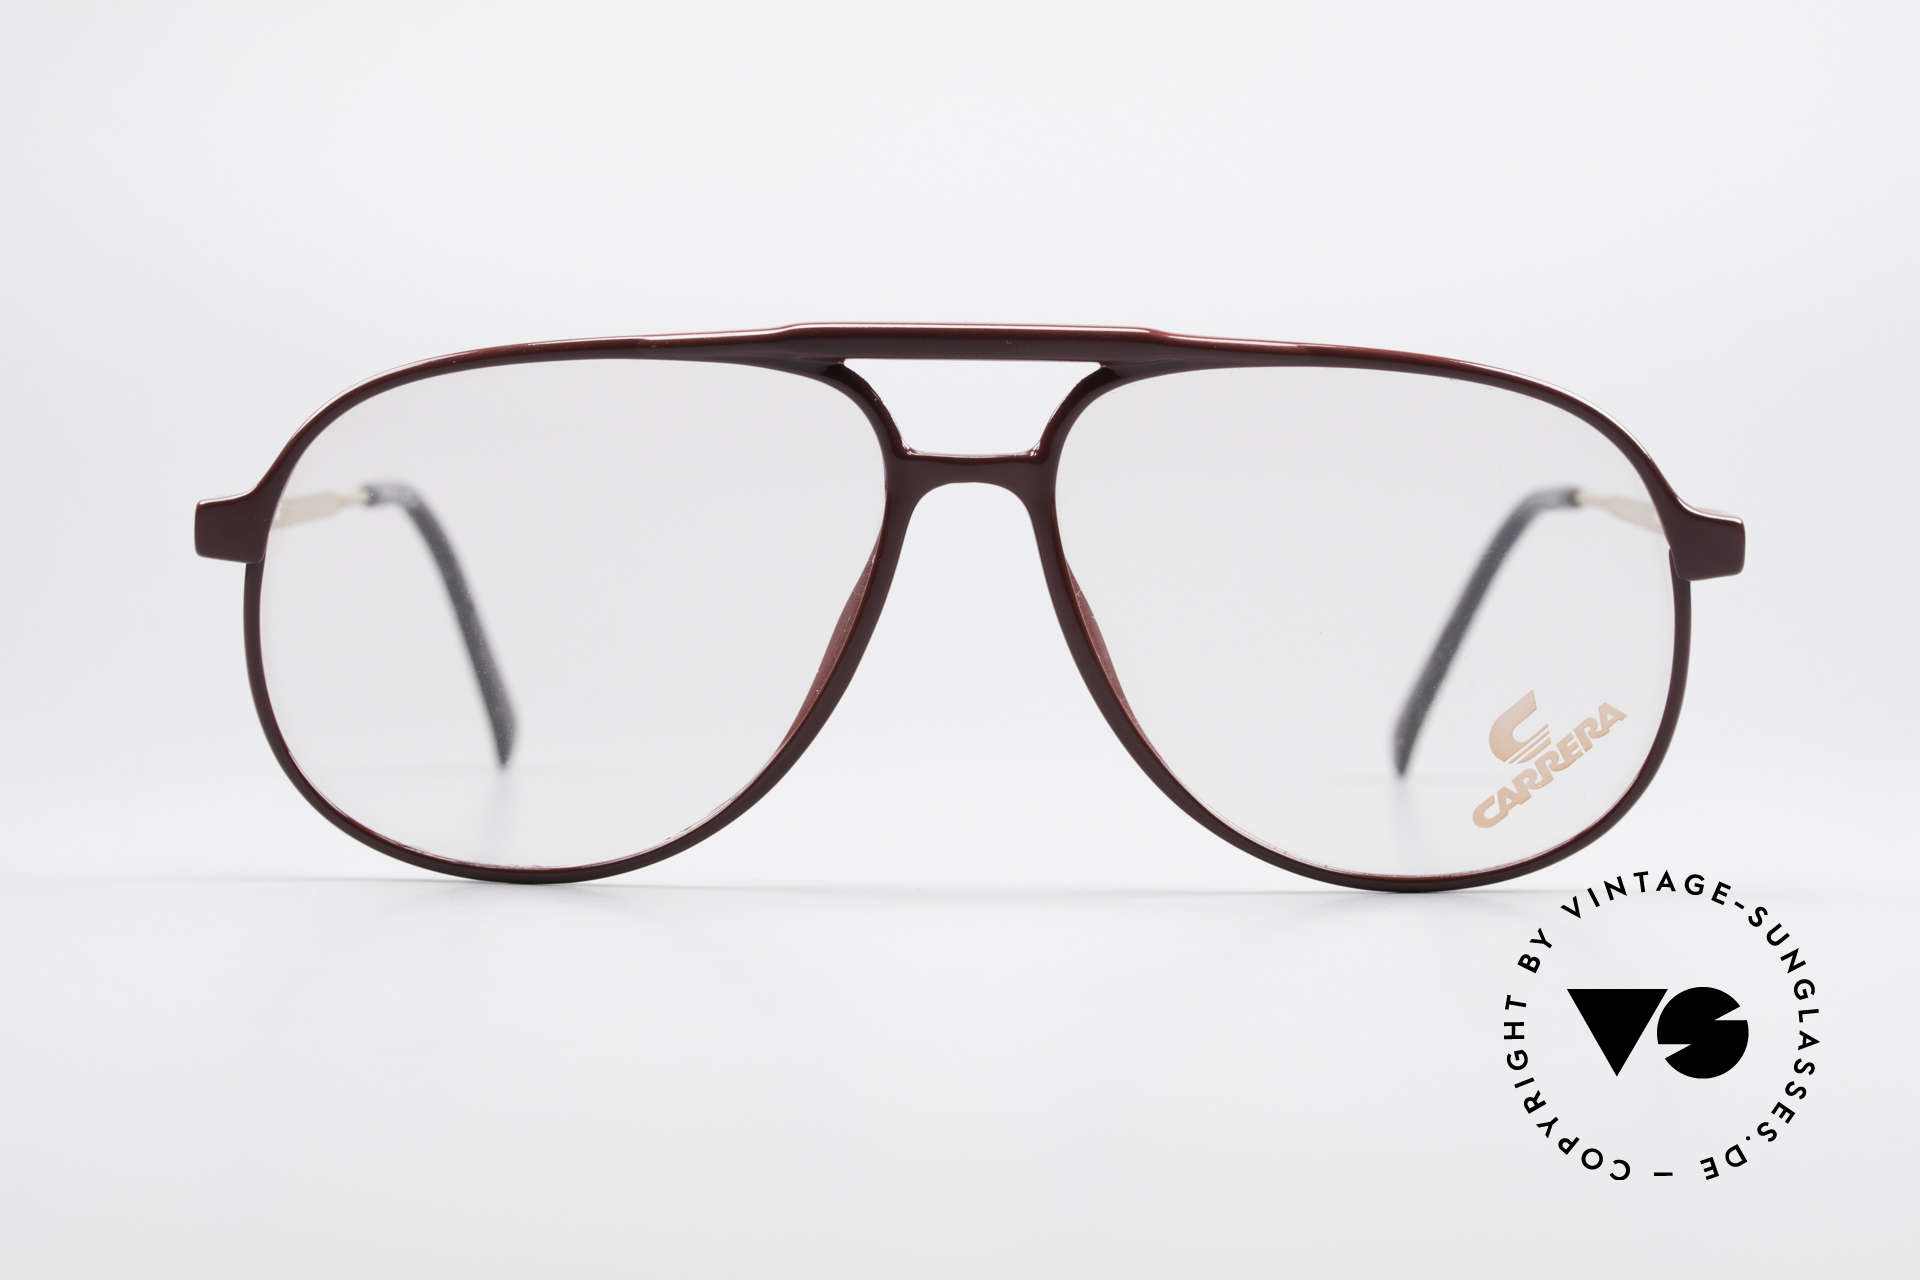 Carrera 5355 Carbon Fibre Aviator Glasses, frame front is made of Carbon Fibre (lightweight), Made for Men